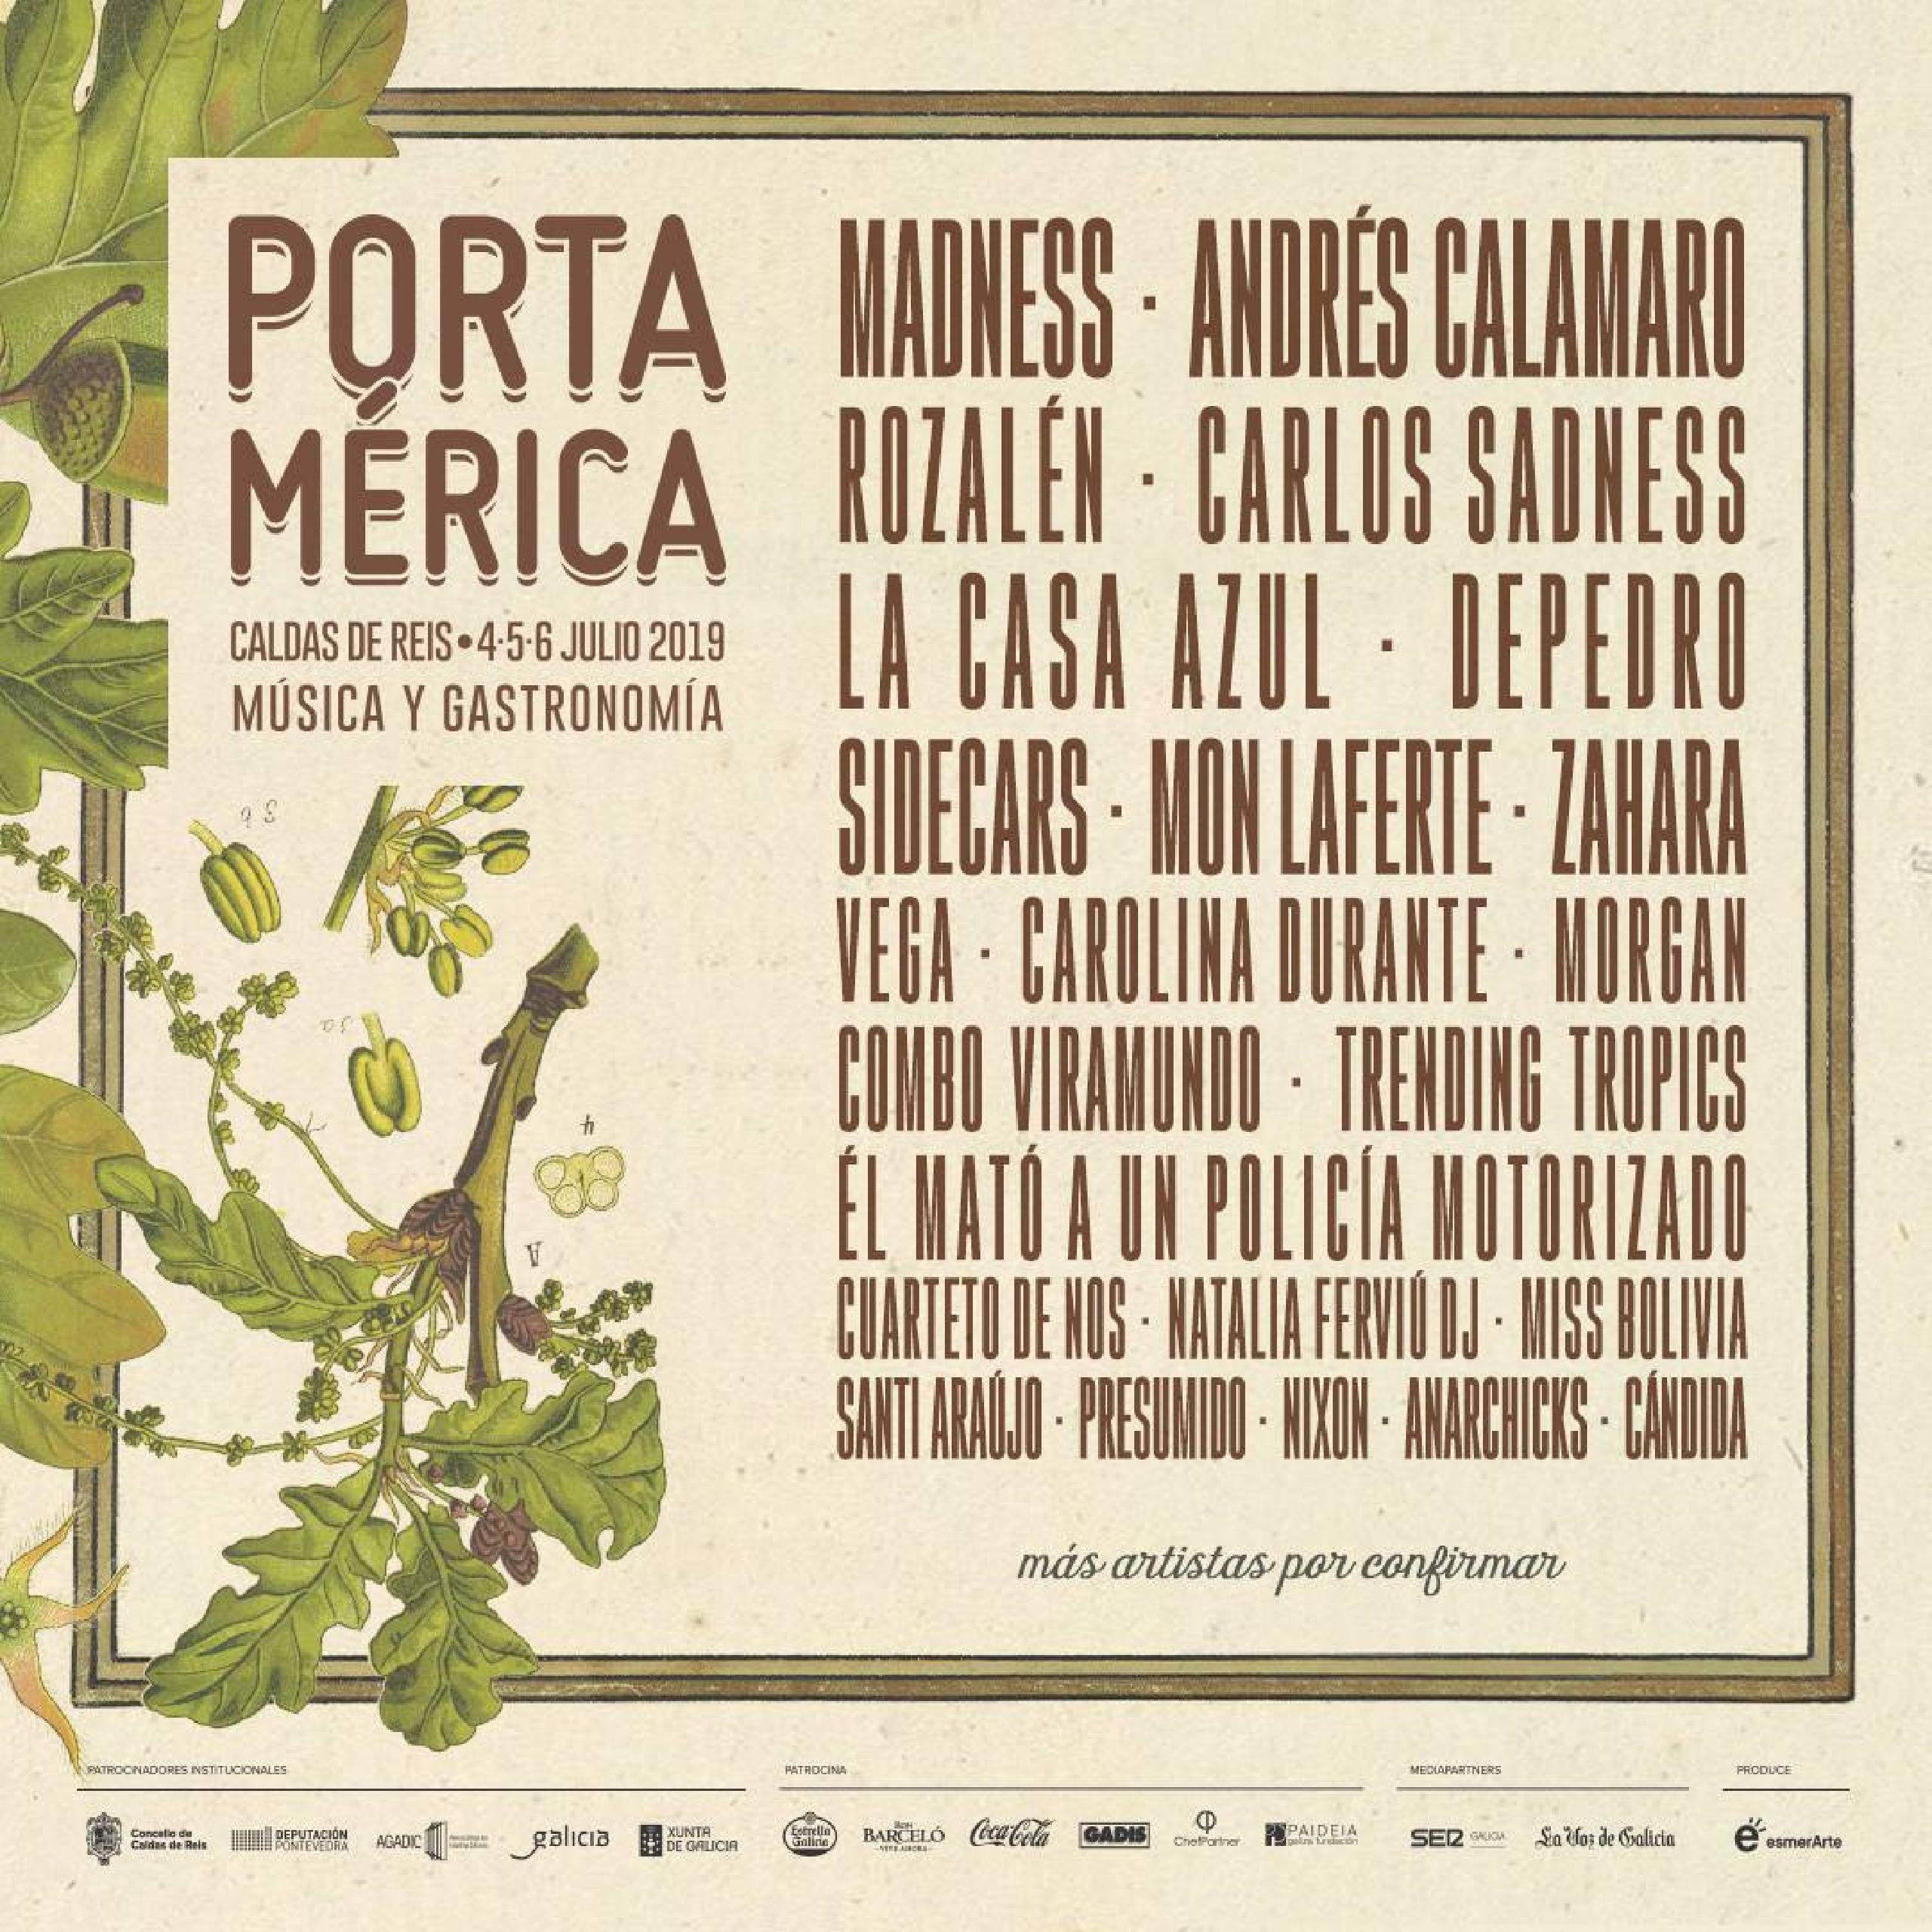 Cartel Portamerica 2019